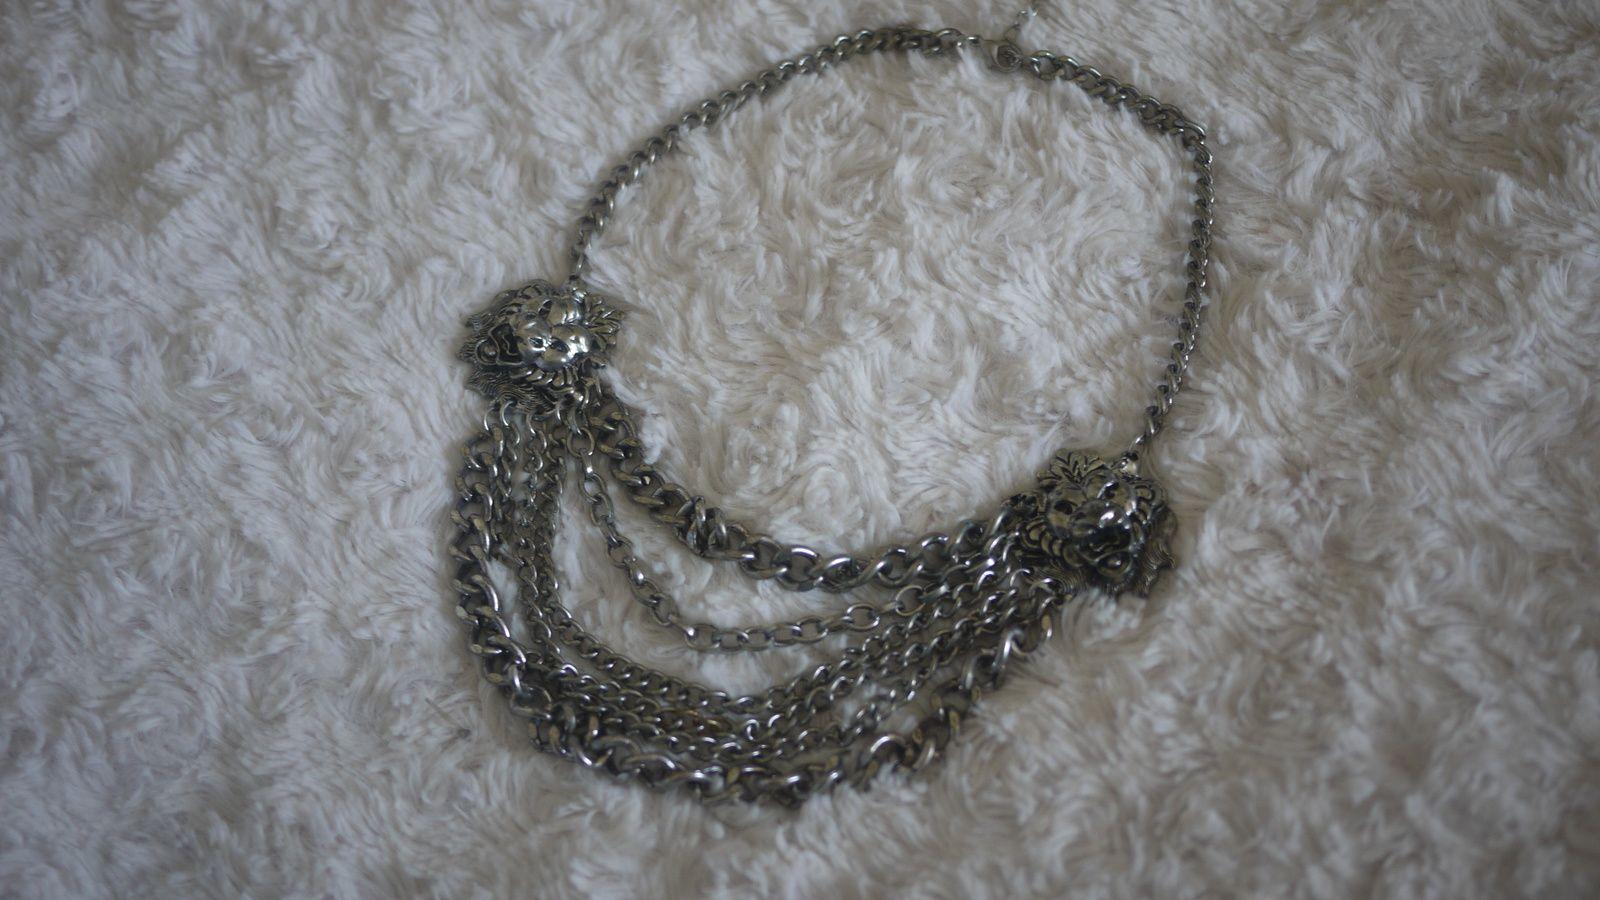 Ma collection de colliers - Juillet 2015